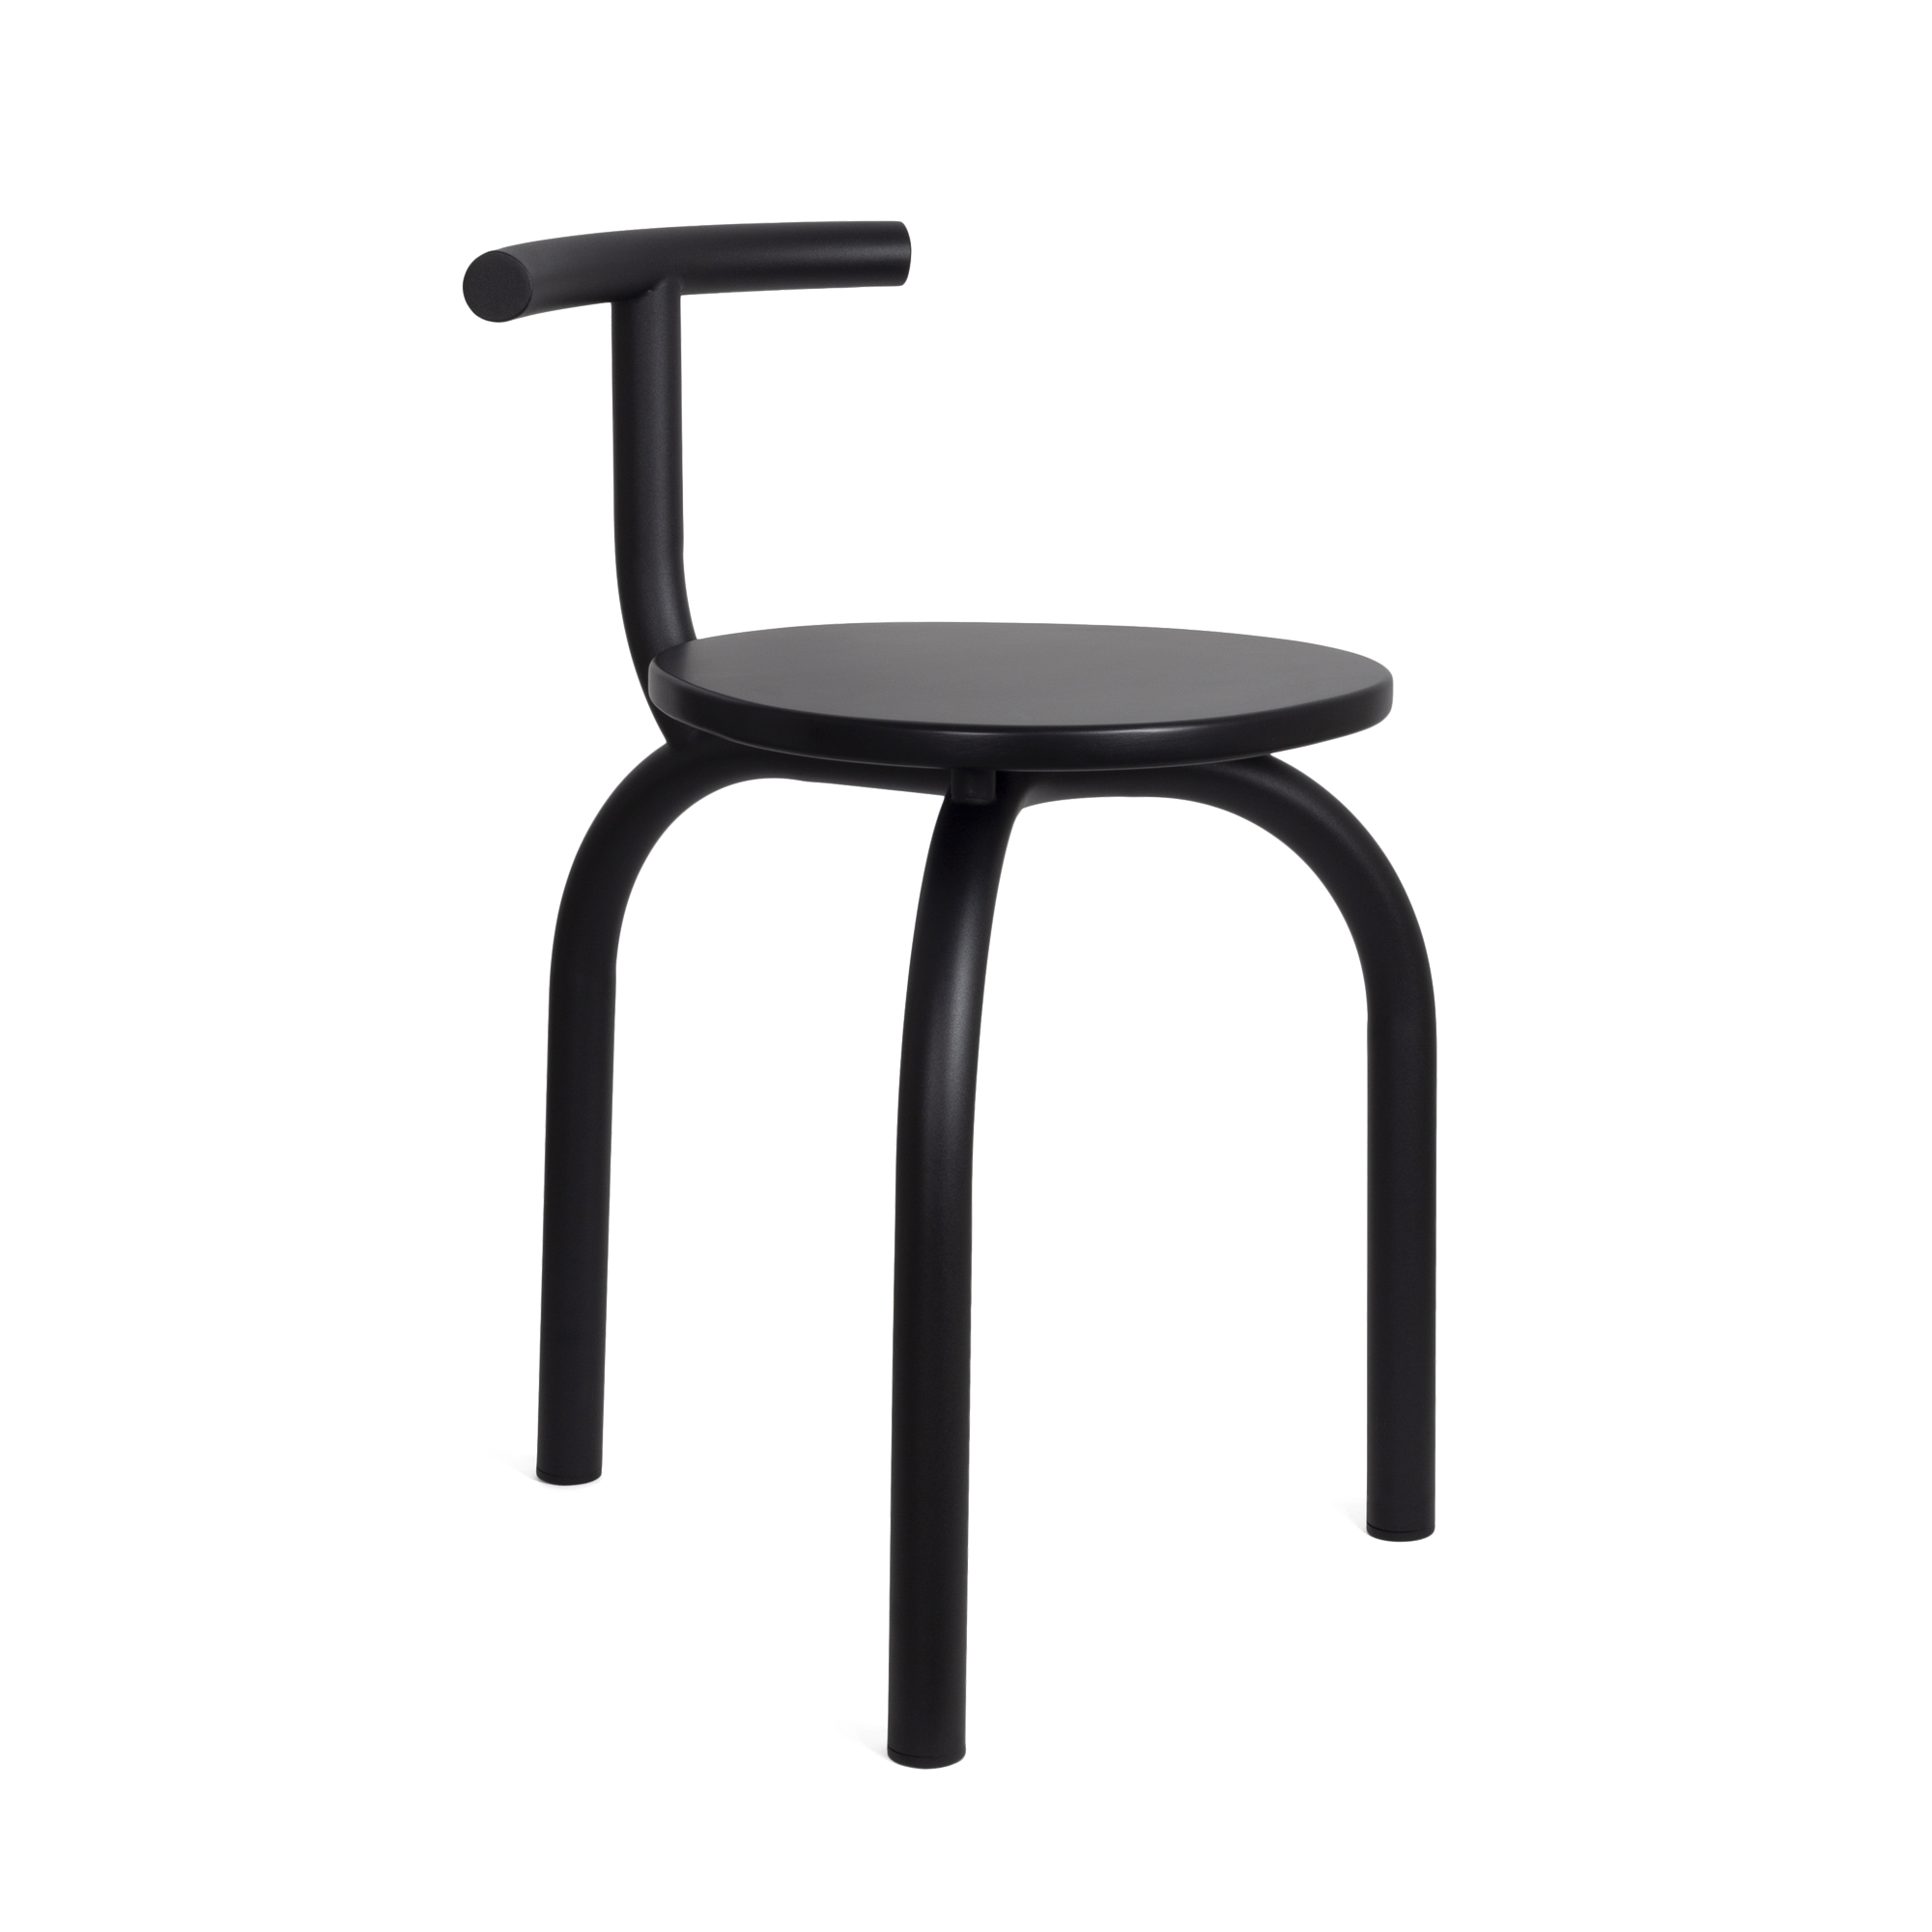 ogle-chair-black-1